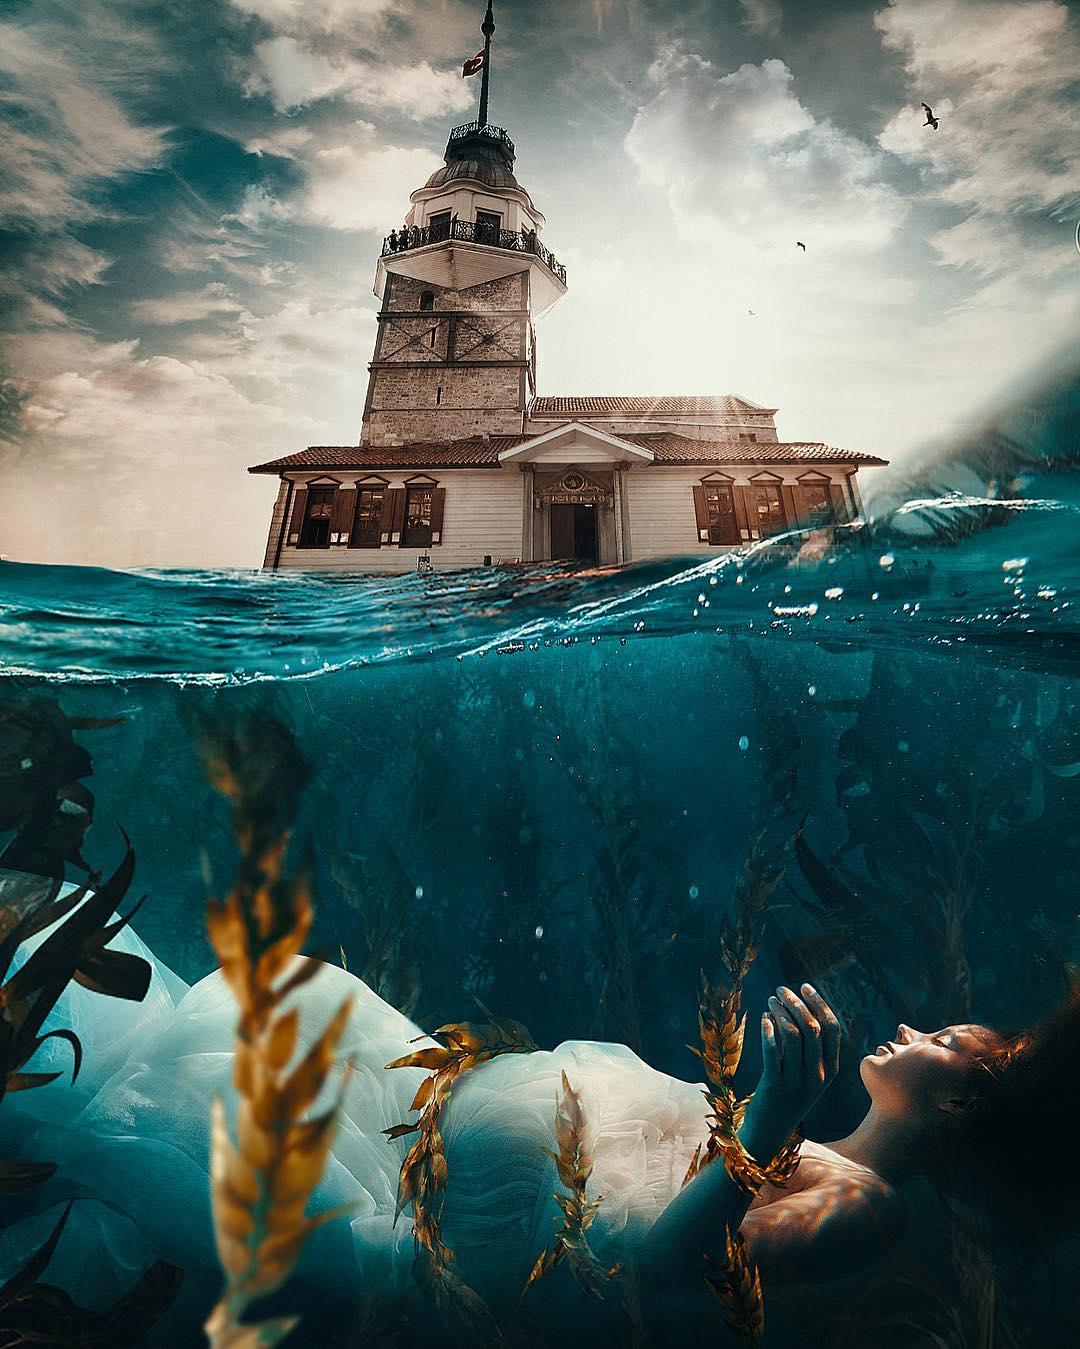 Le photo manipulations di Hüseyin Sahin   Collater.al